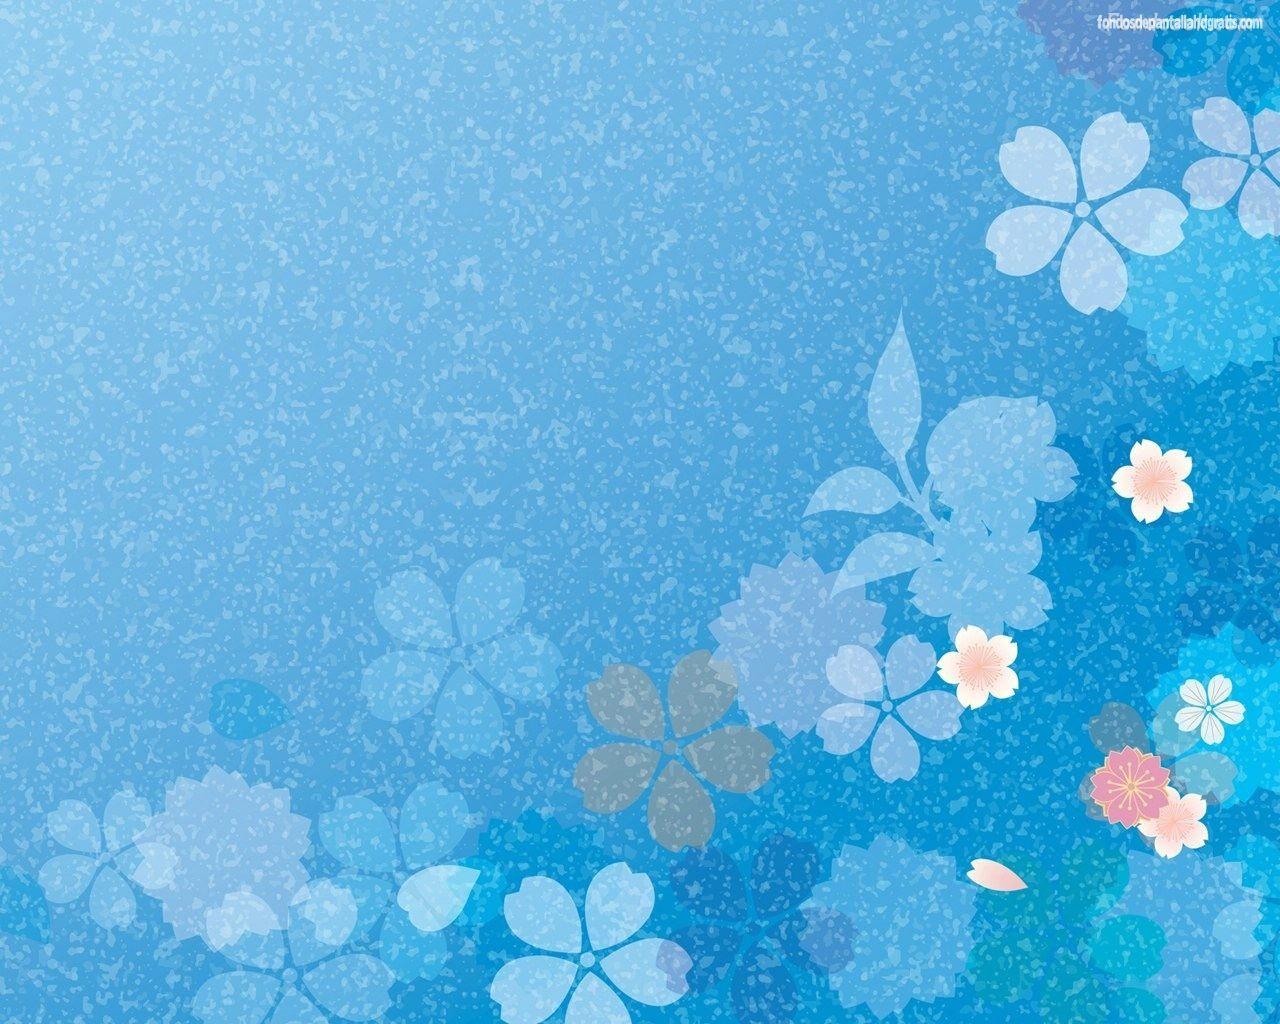 Fondos De Pantalla De Perros Wallpapers Hd: Wallpapers De Flores Azules Para Fondo De Pantalla En Hd